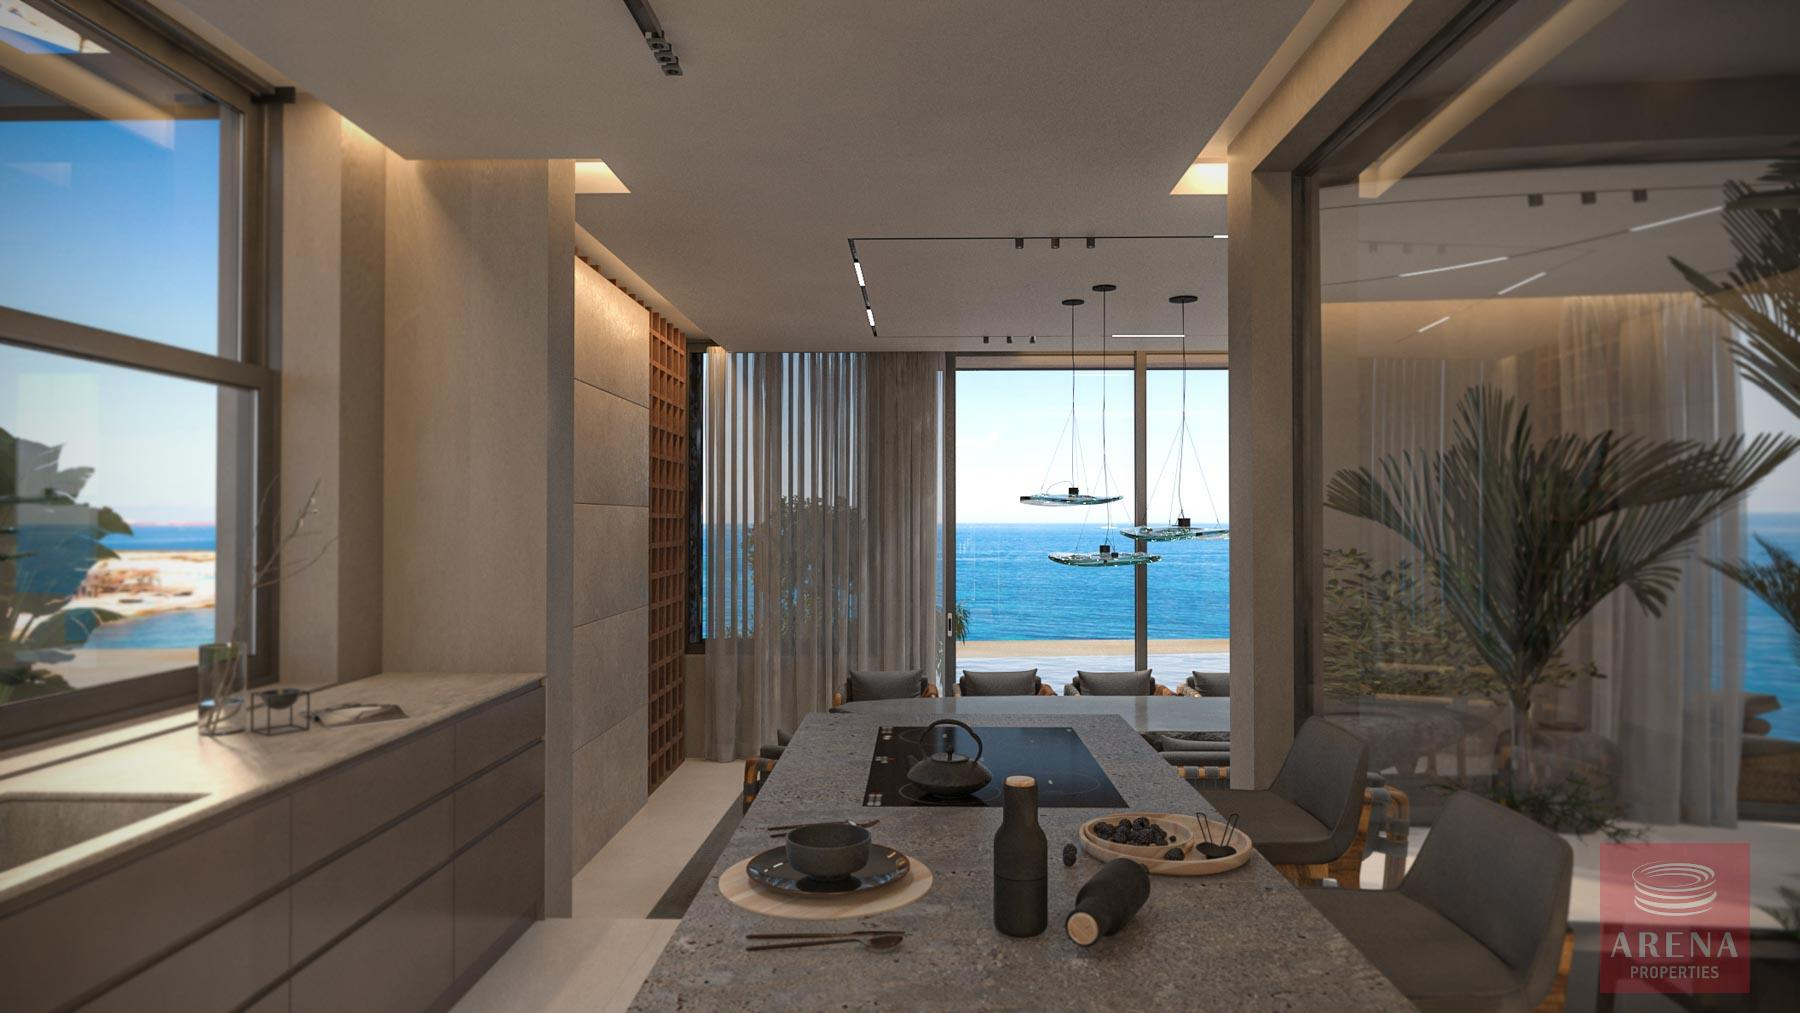 4 Bed Seafron Villa in Kapparis - kitchen